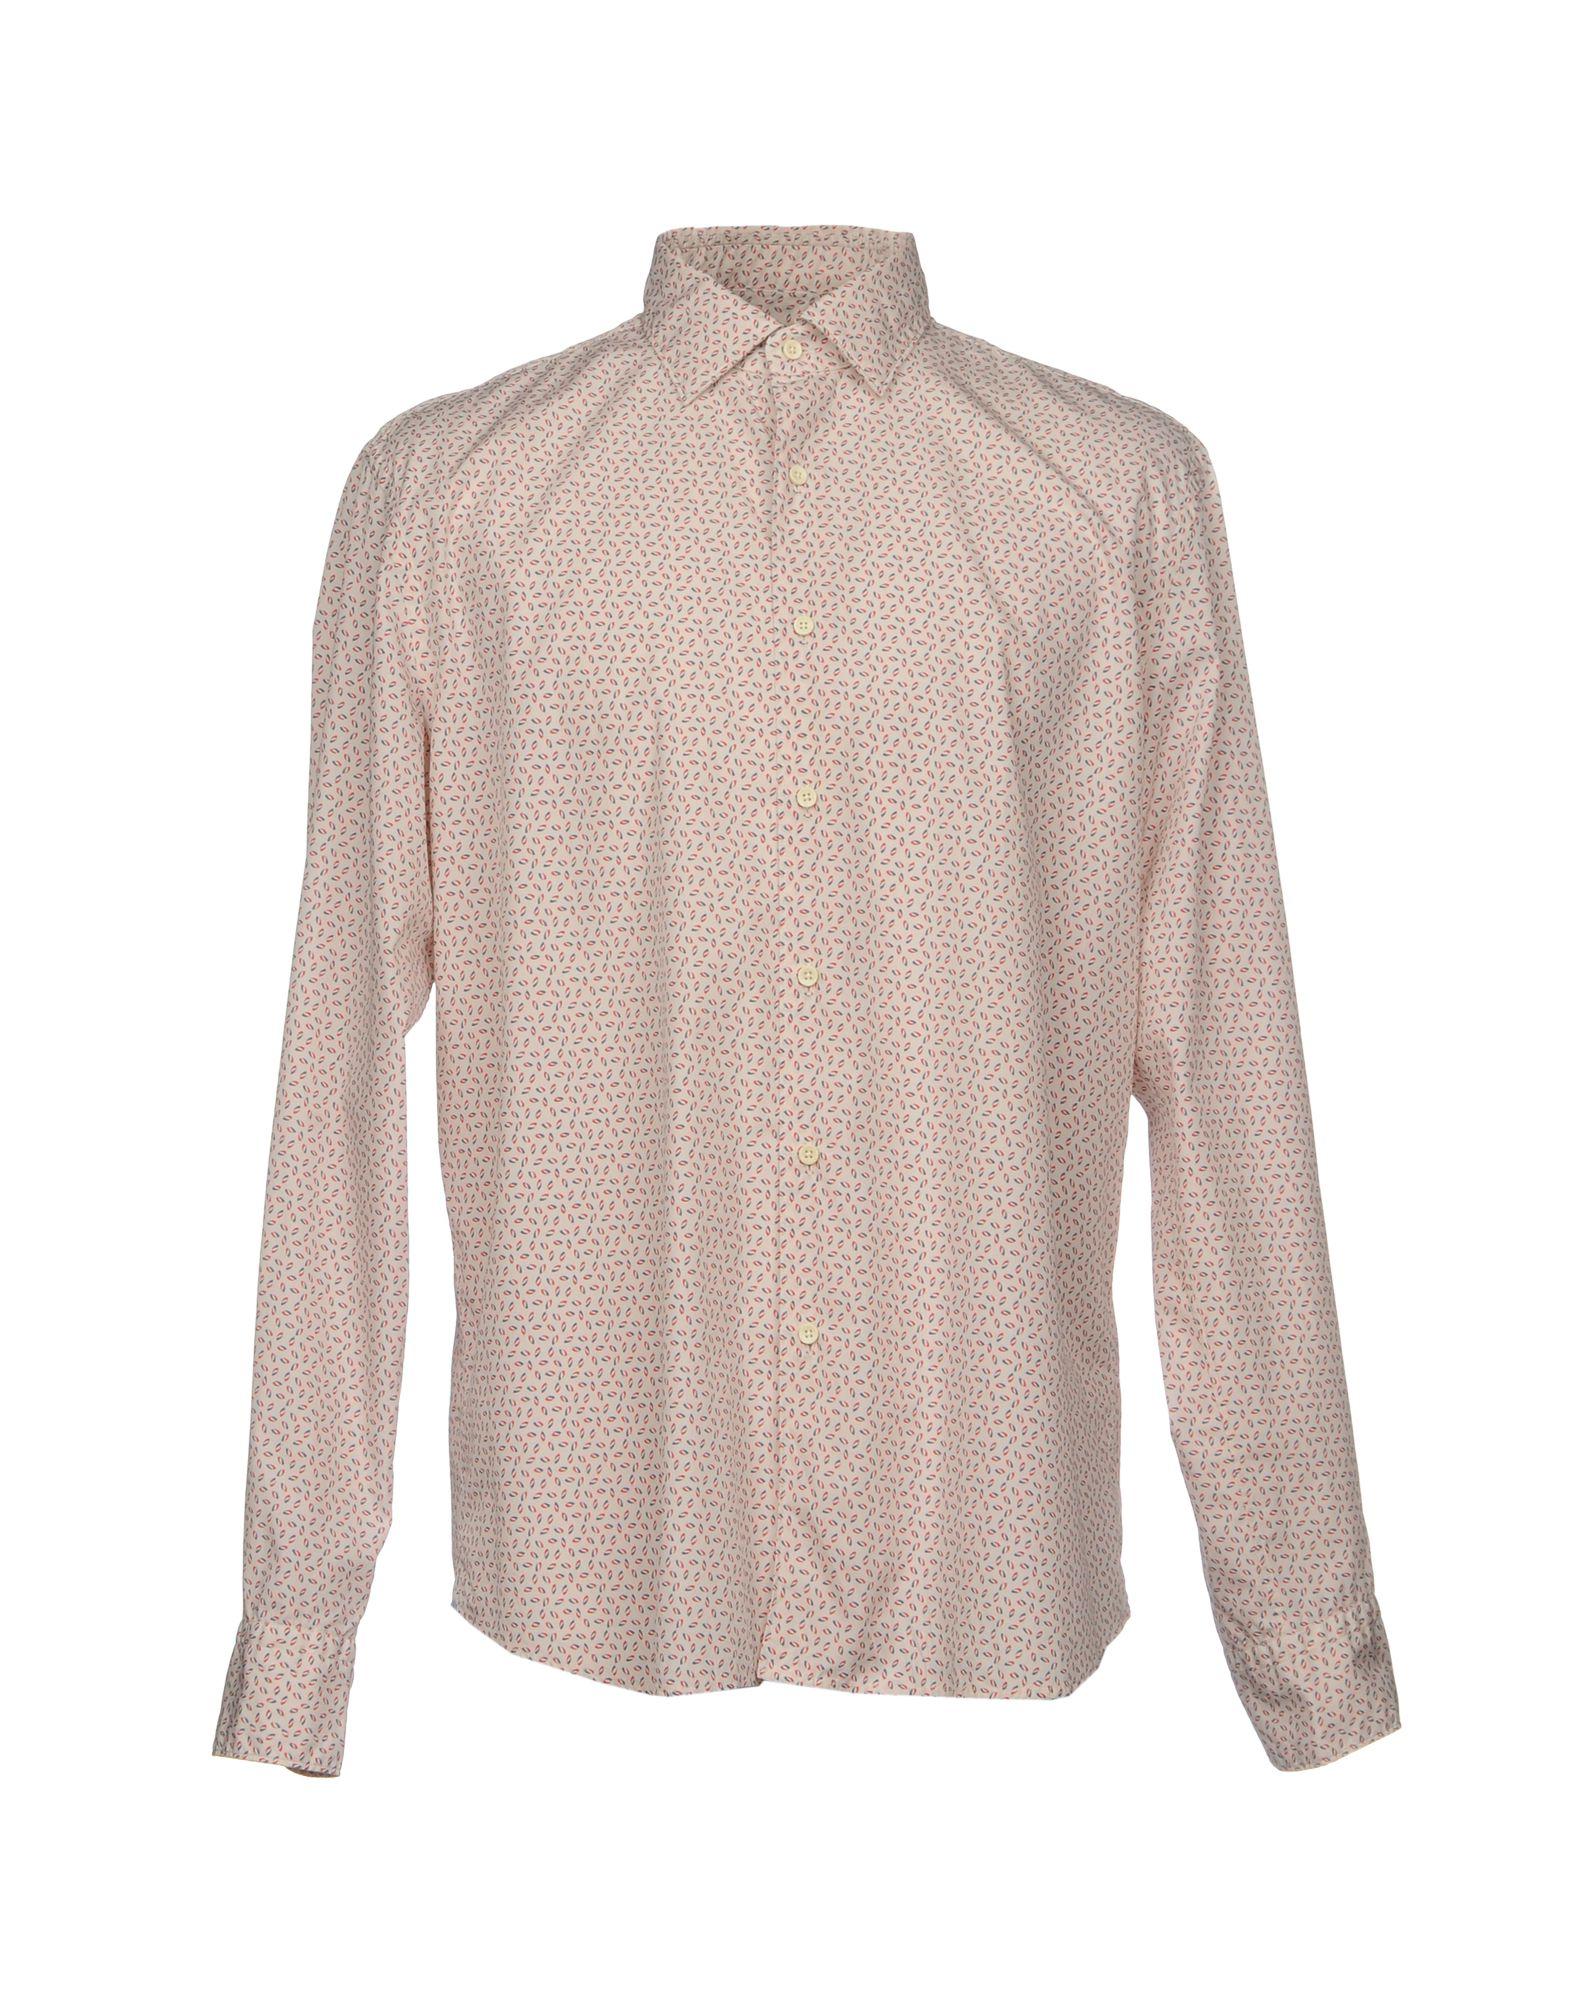 Camicia Fantasia Xacus Uomo - Acquista online su